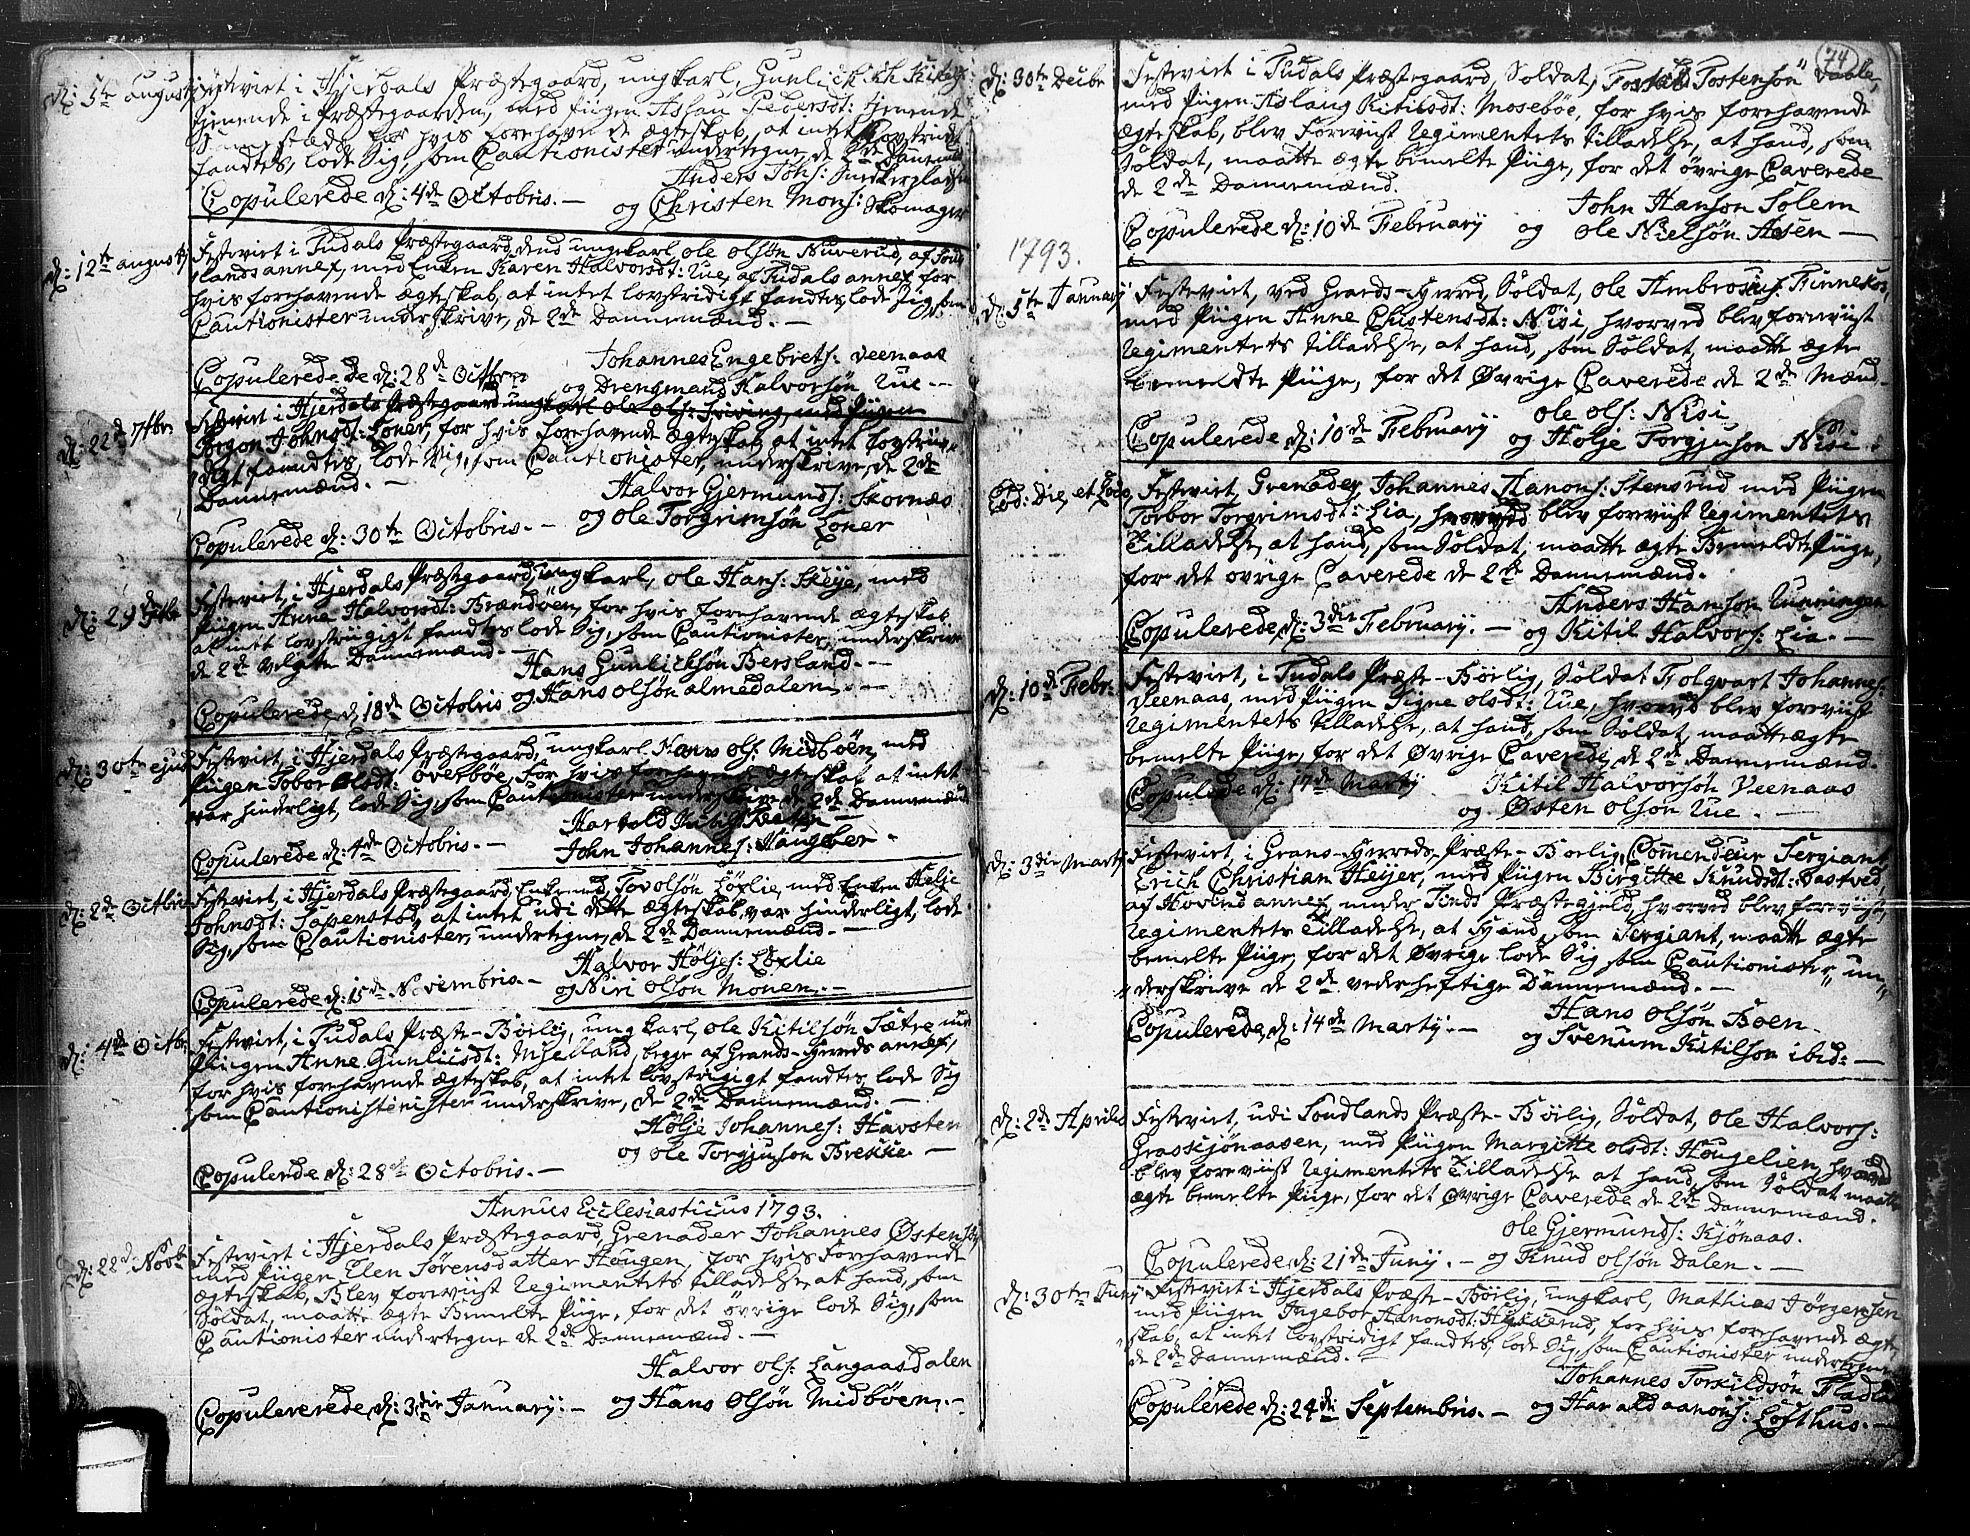 SAKO, Hjartdal kirkebøker, F/Fa/L0004: Ministerialbok nr. I 4, 1727-1795, s. 74